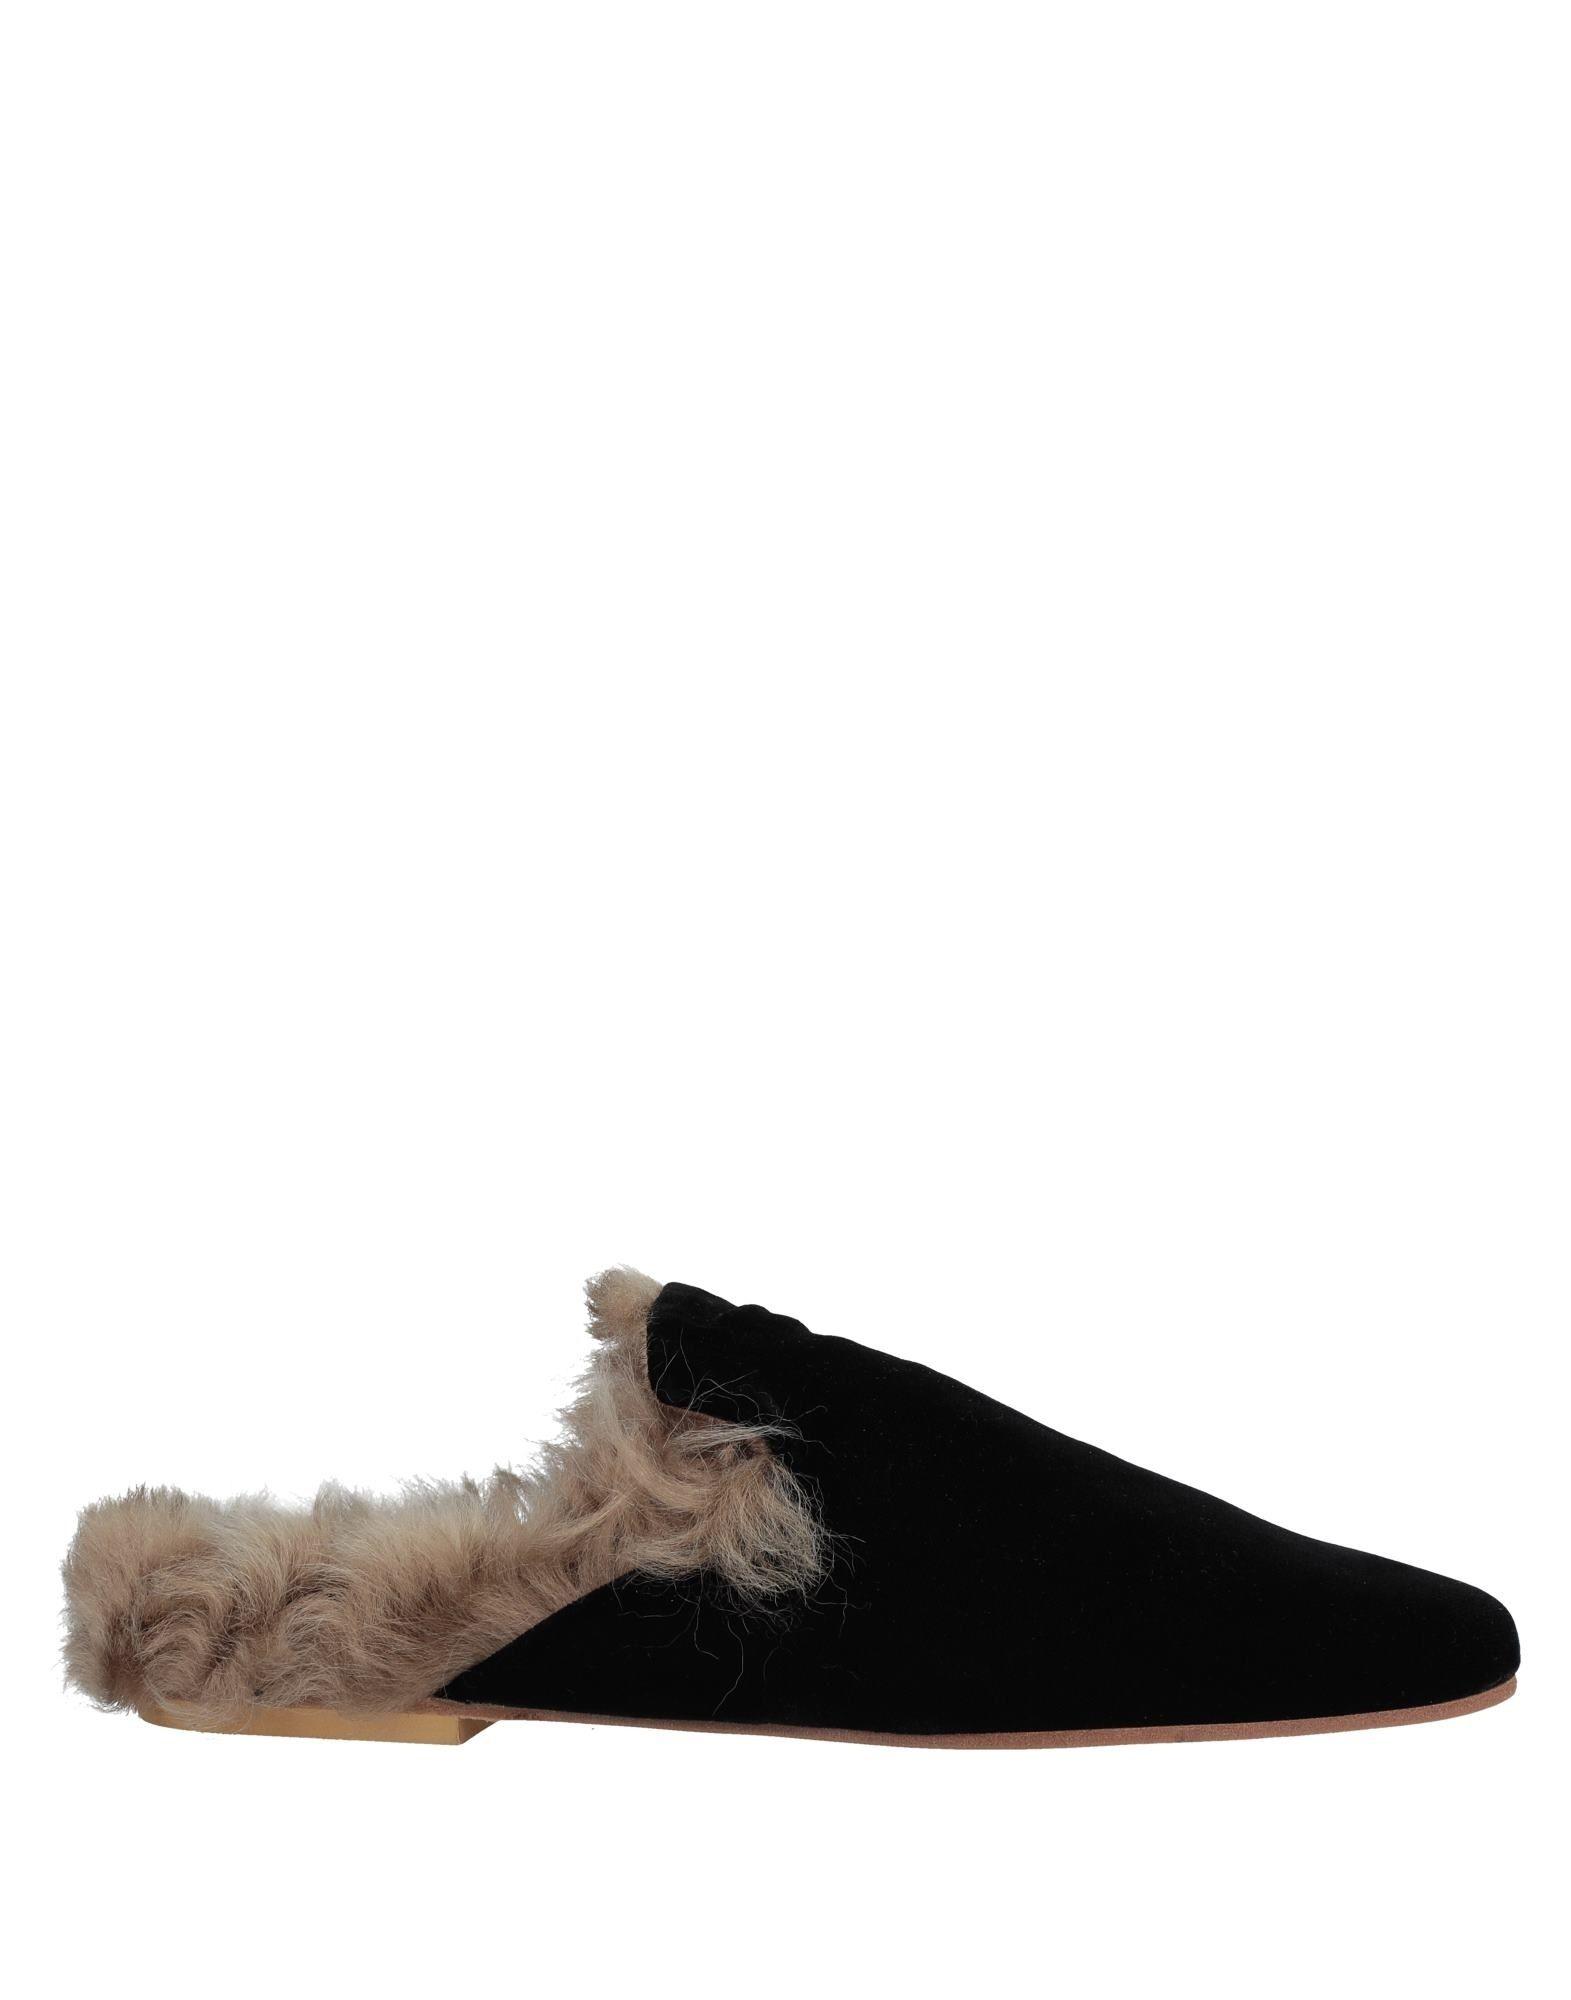 Stilvolle billige Schuhe  Gia Couture Pantoletten Damen  Schuhe 11534025PL 8b4430